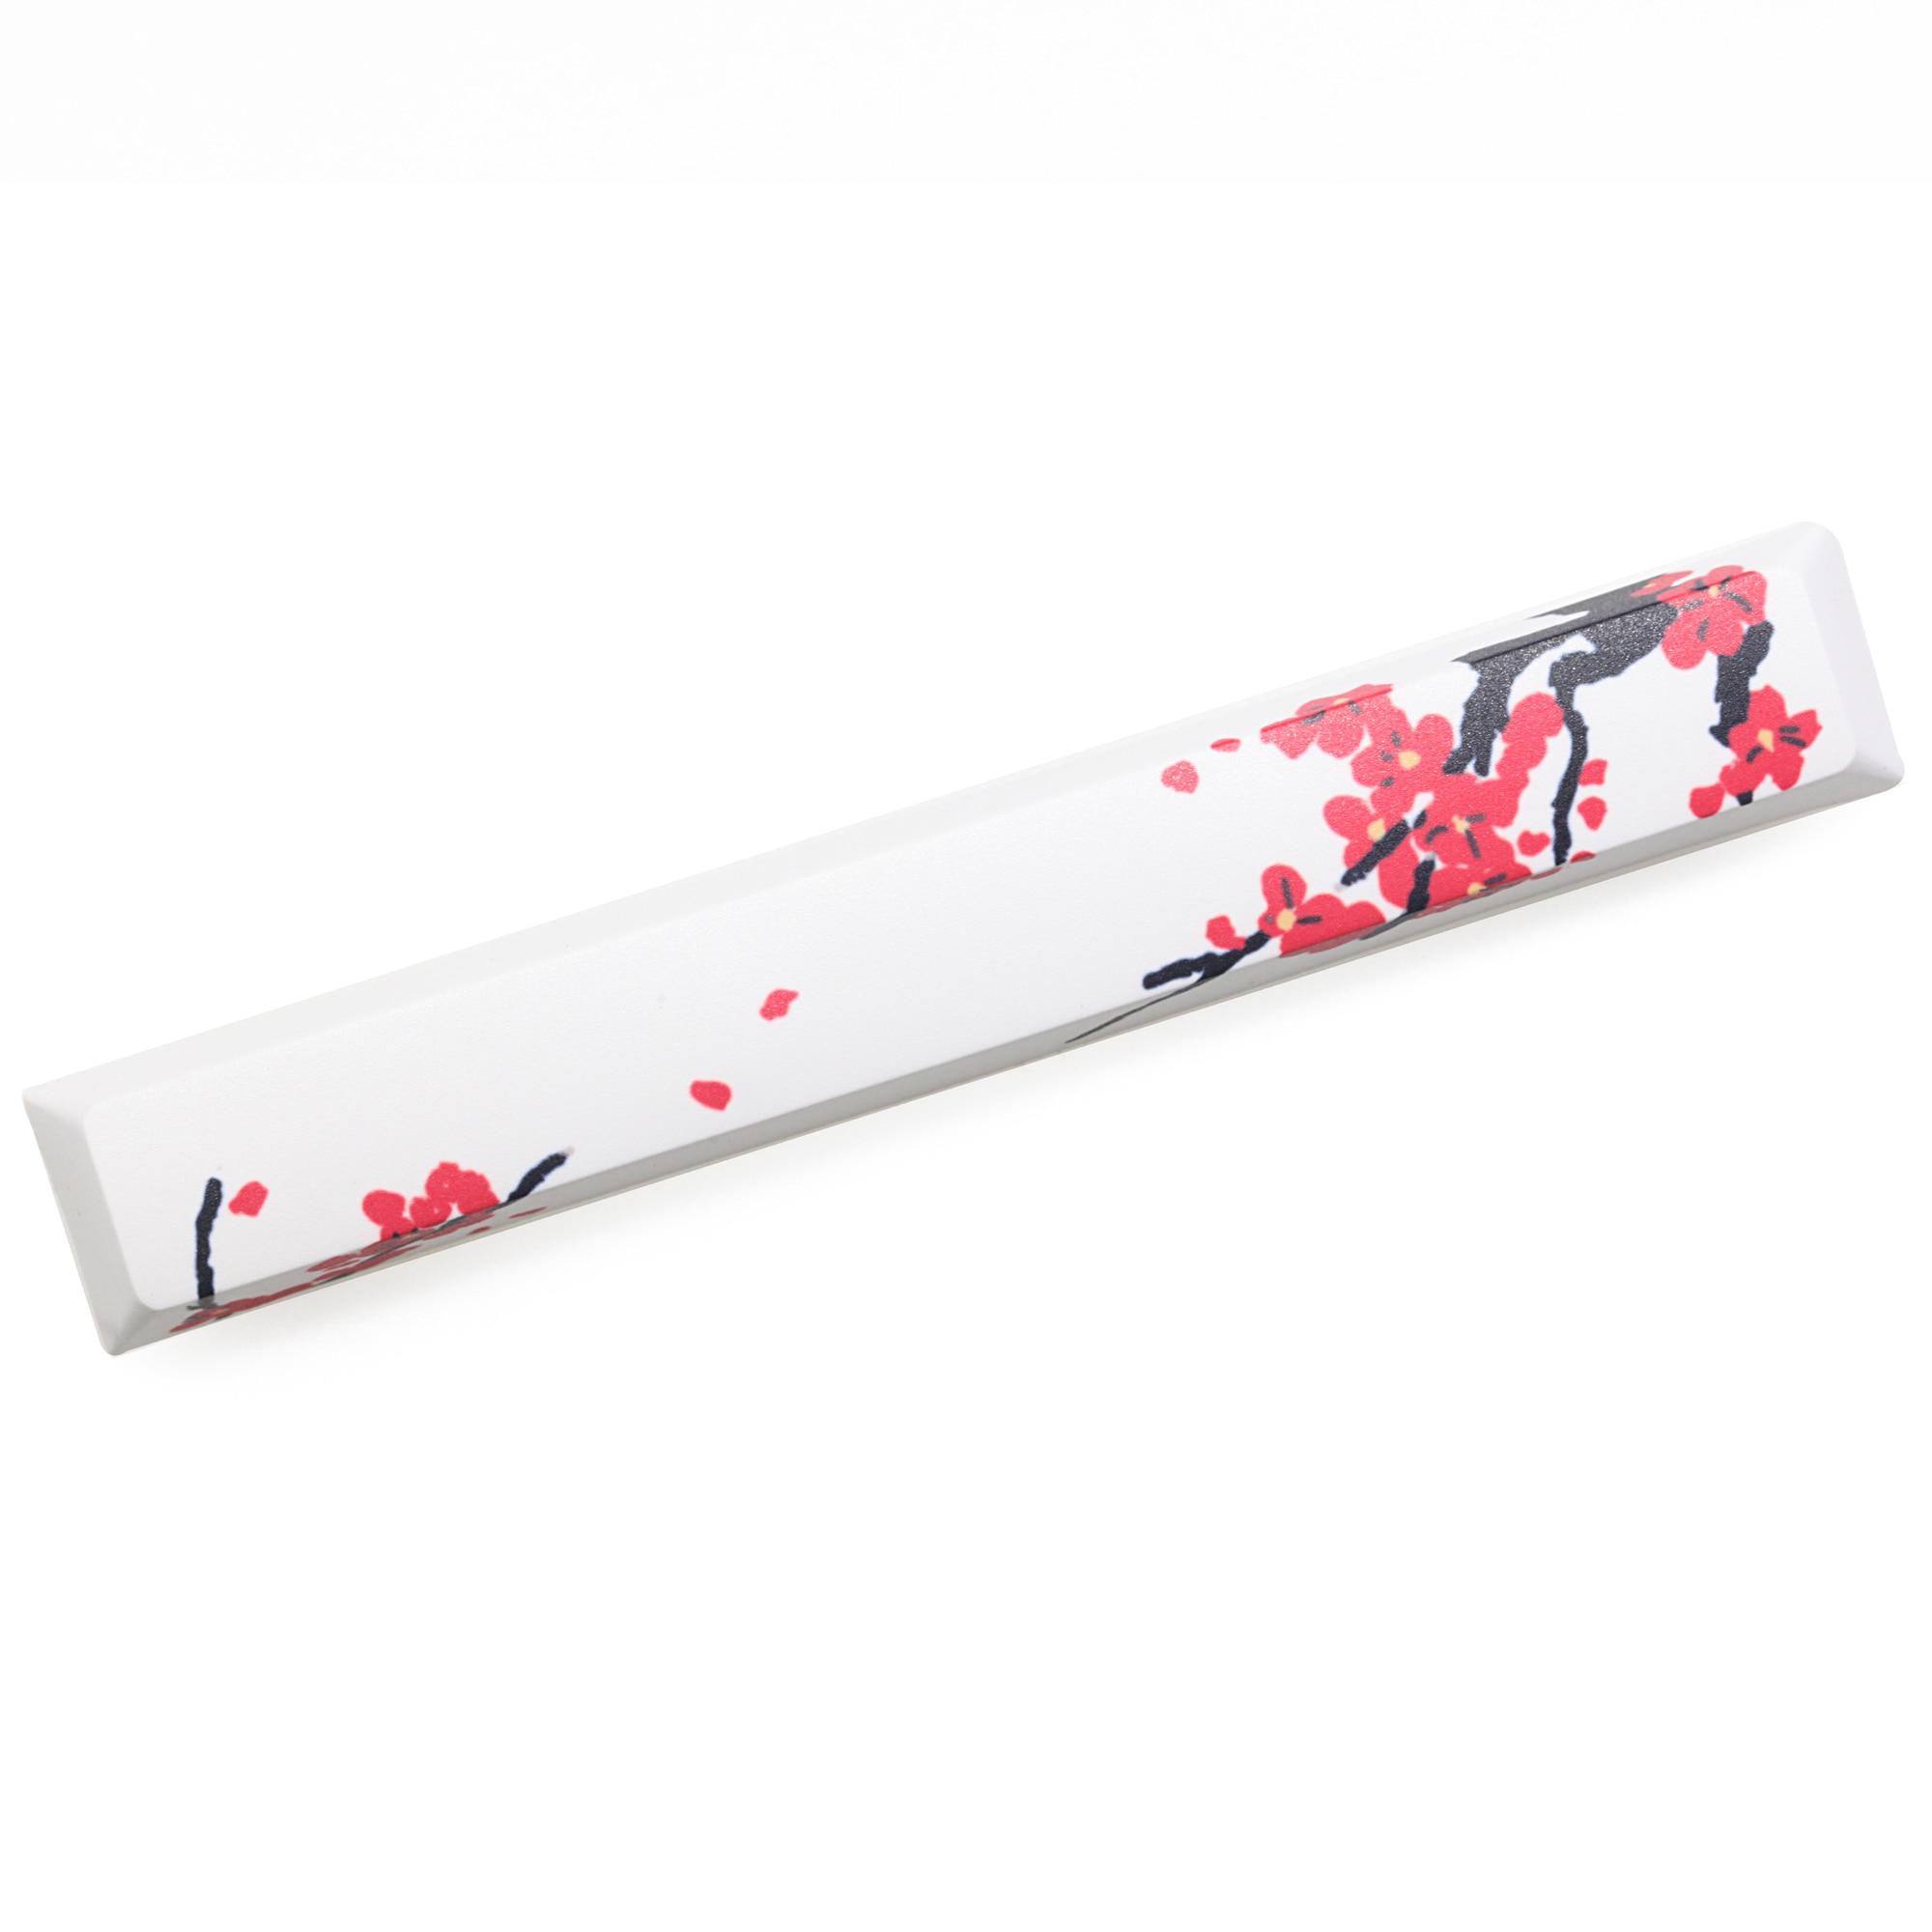 Mstone Novelty Allover Dye Subbed Keycap Spacebar Pbt Custom Mechanical Keyboard Beauty Of Spring  6.25u Cherry Profile